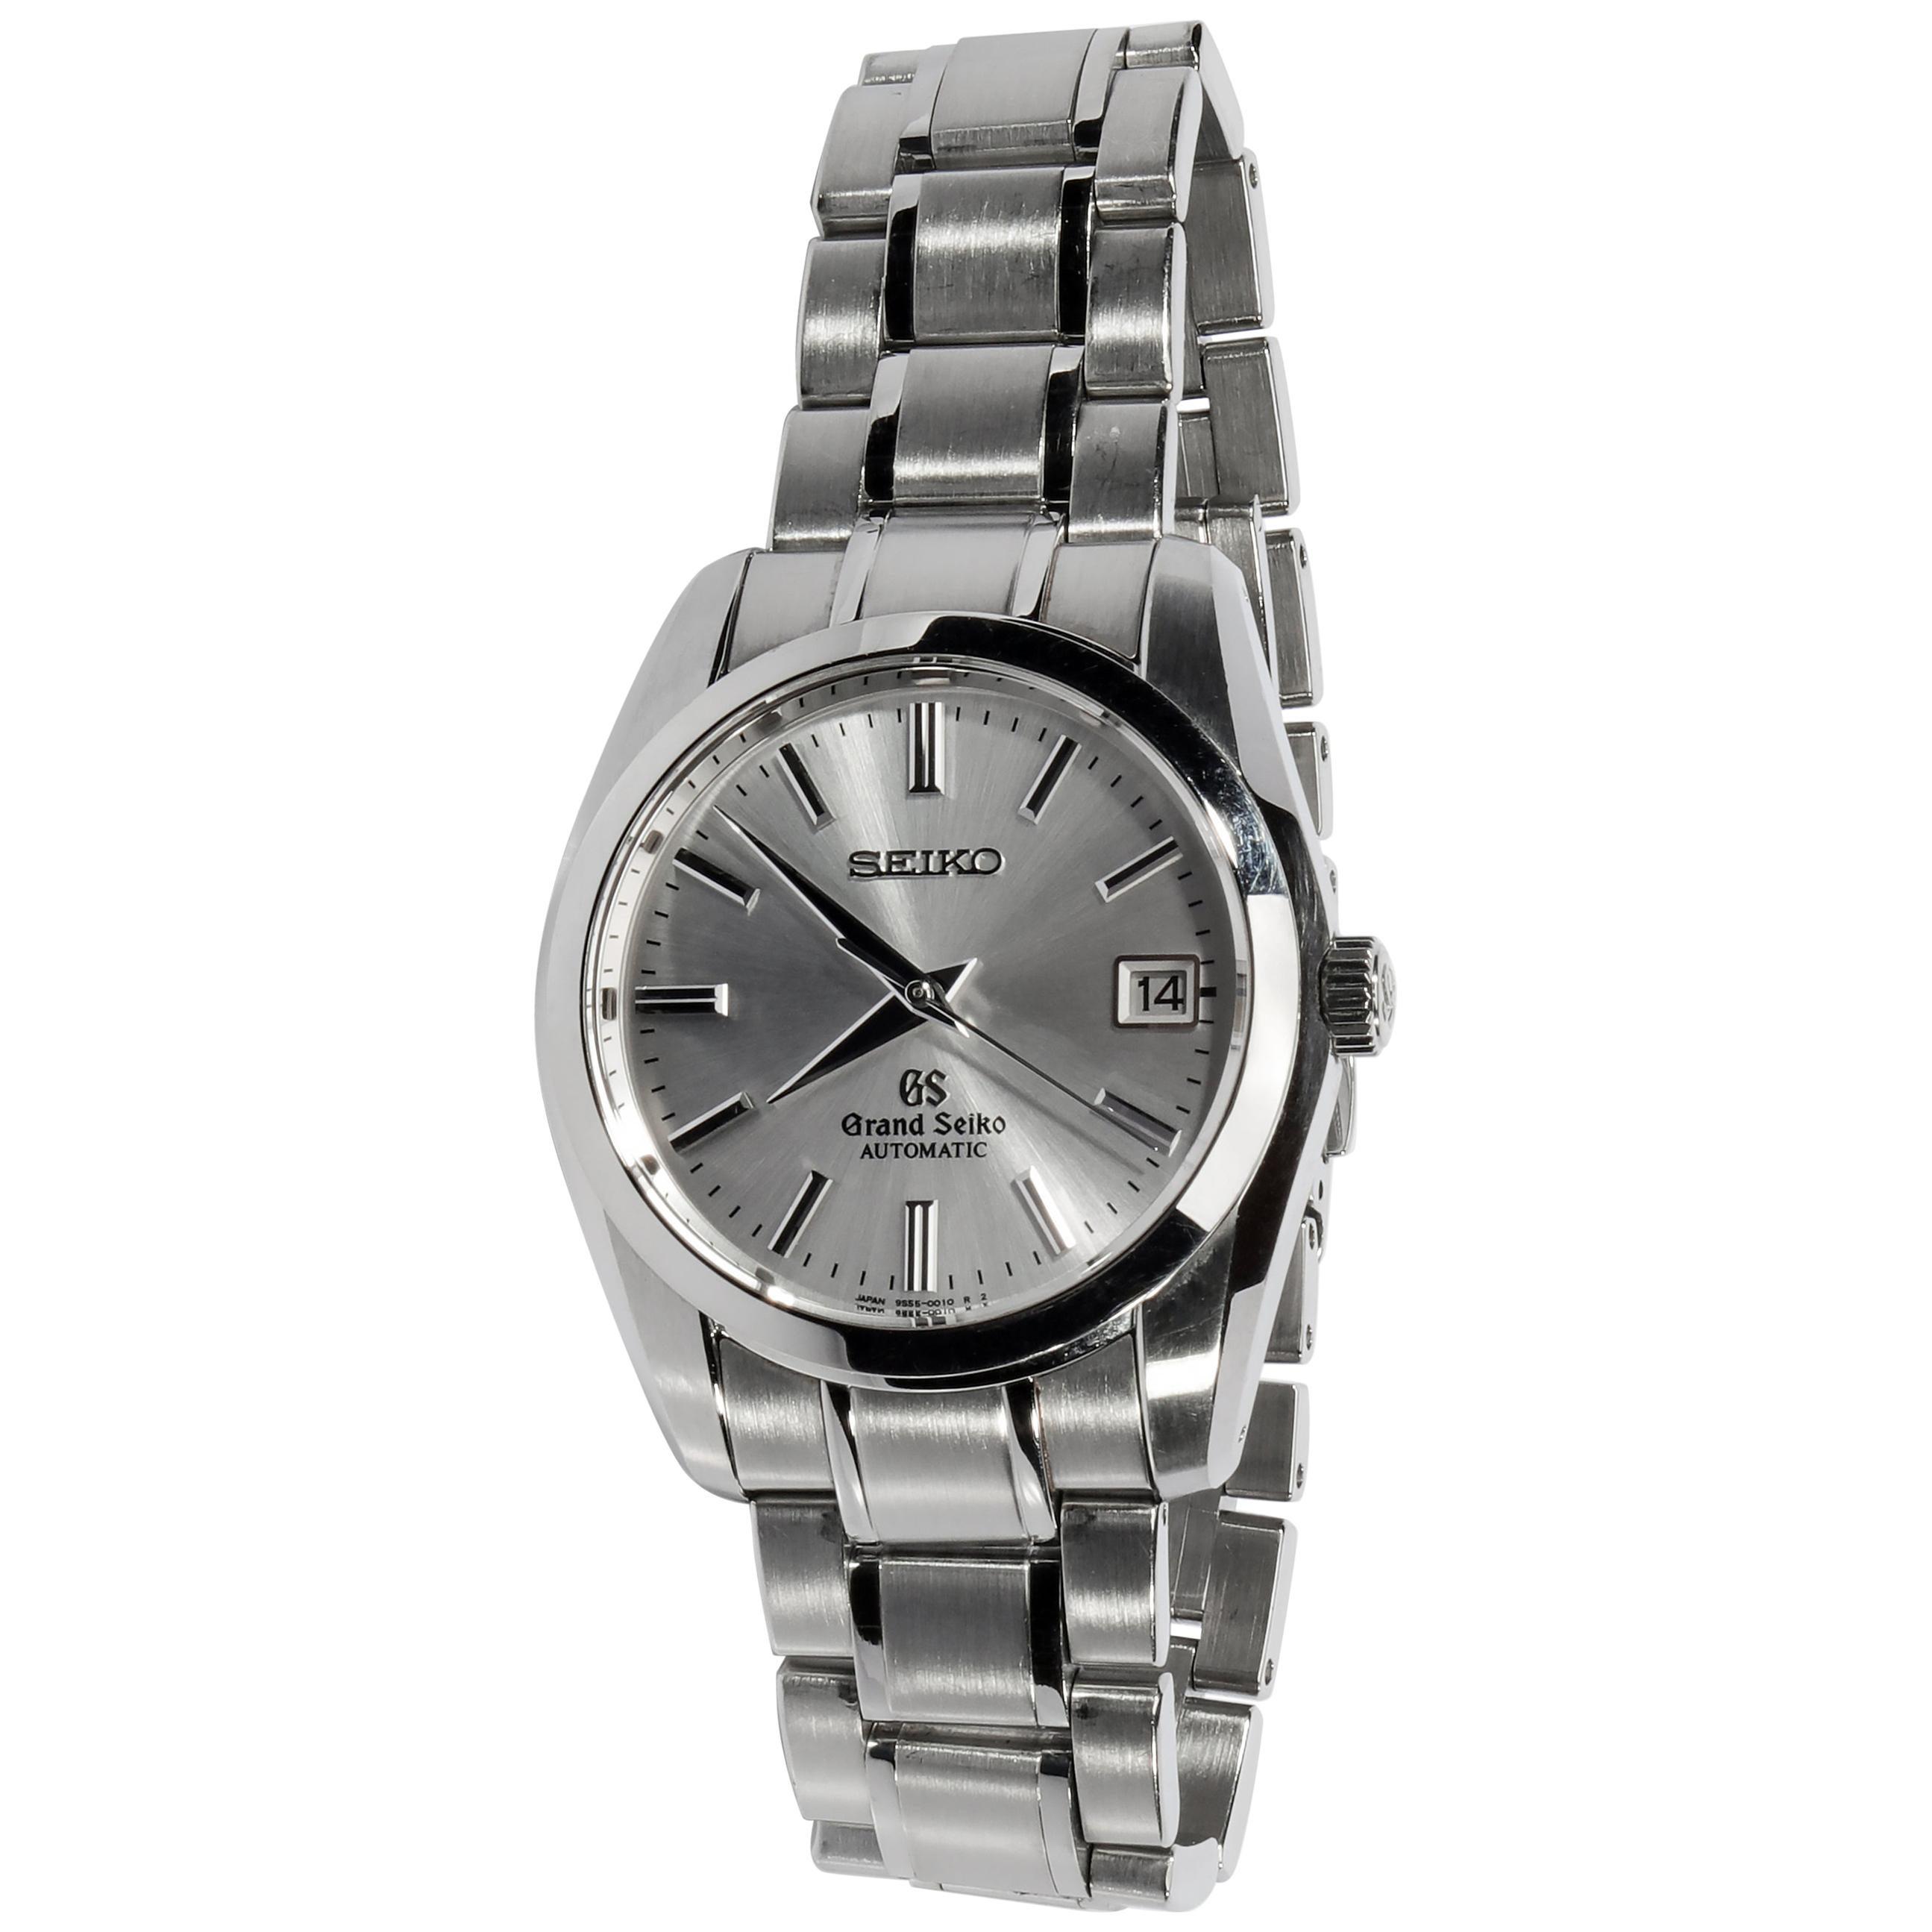 Grand Seiko Mechanical Automatic Watch SBGR001